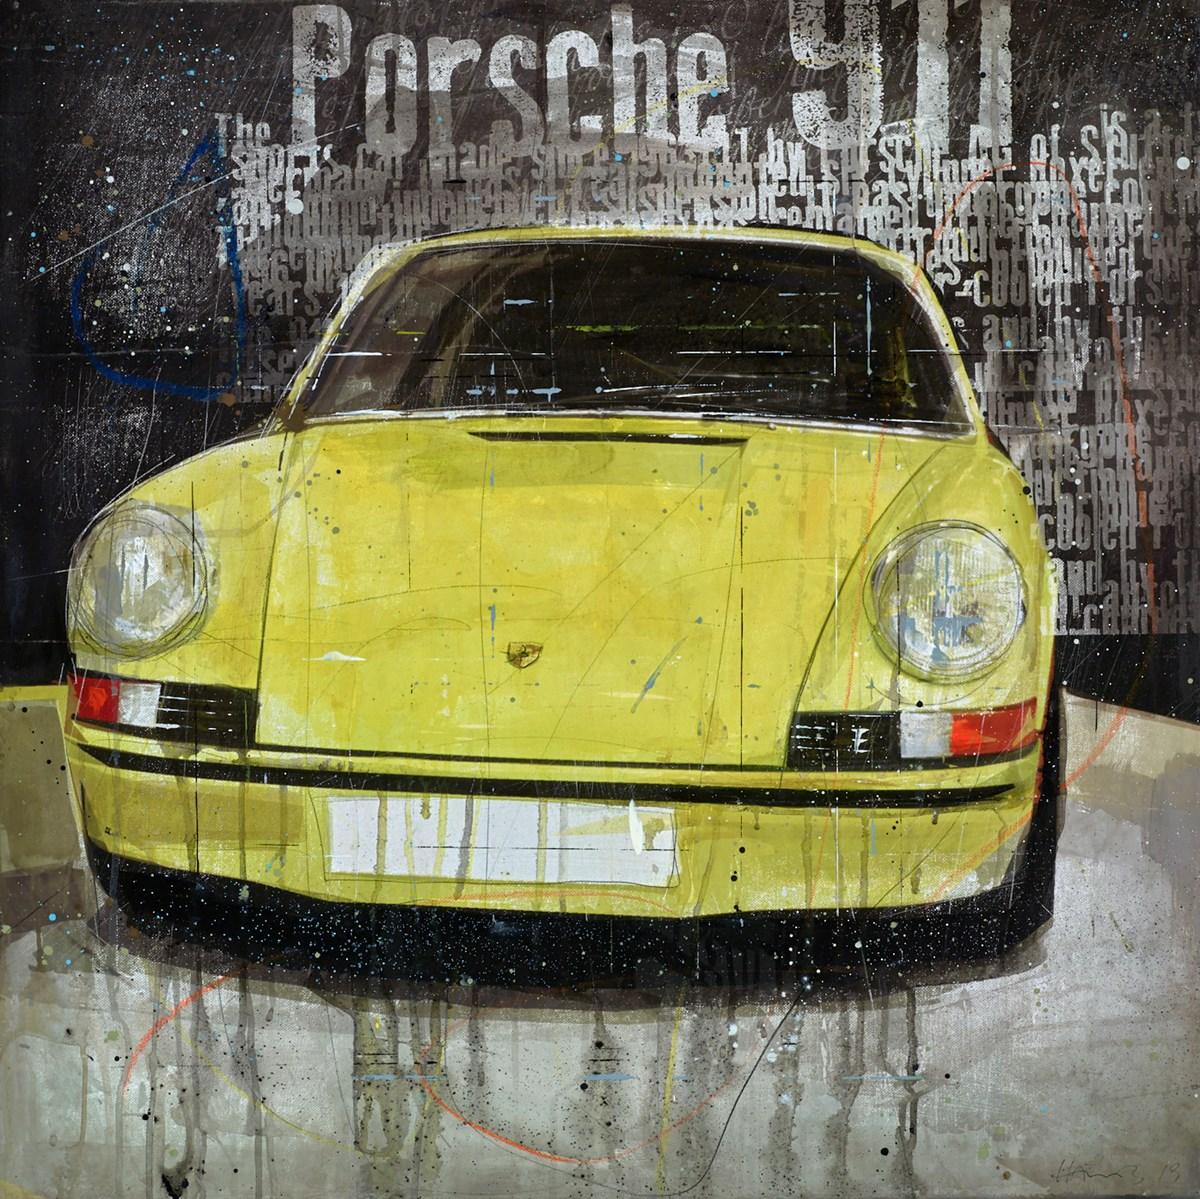 Porsche 911 (Yellow)